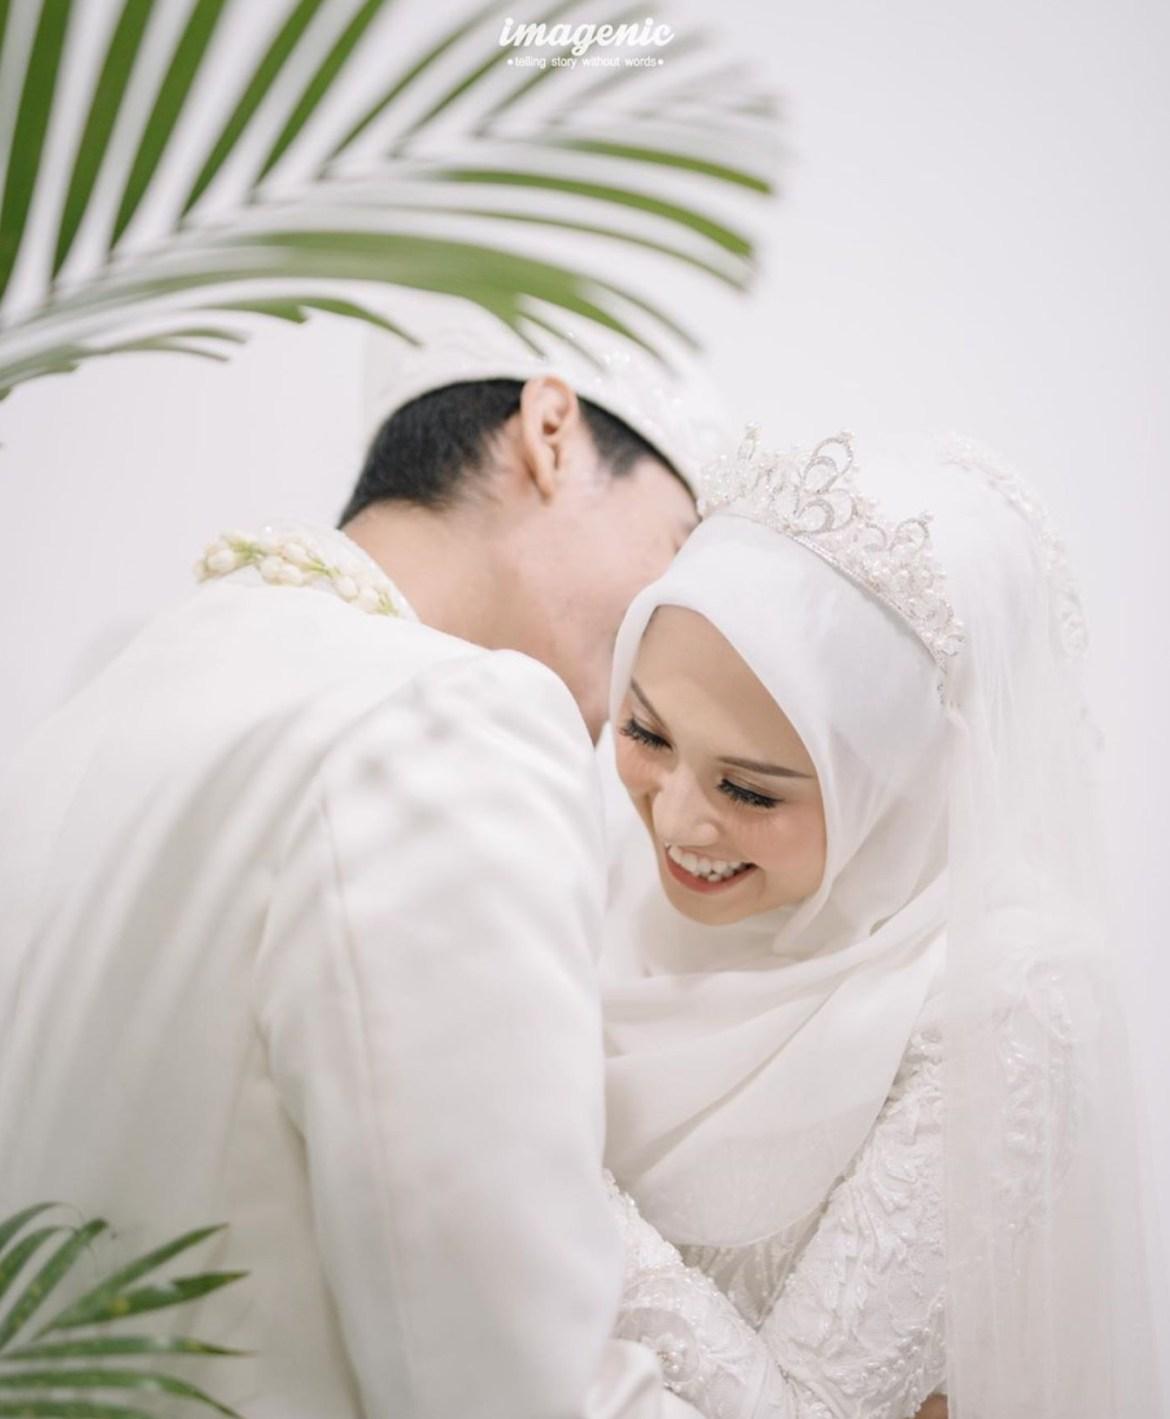 Contoh Busana Pernikahan Islami terbaru